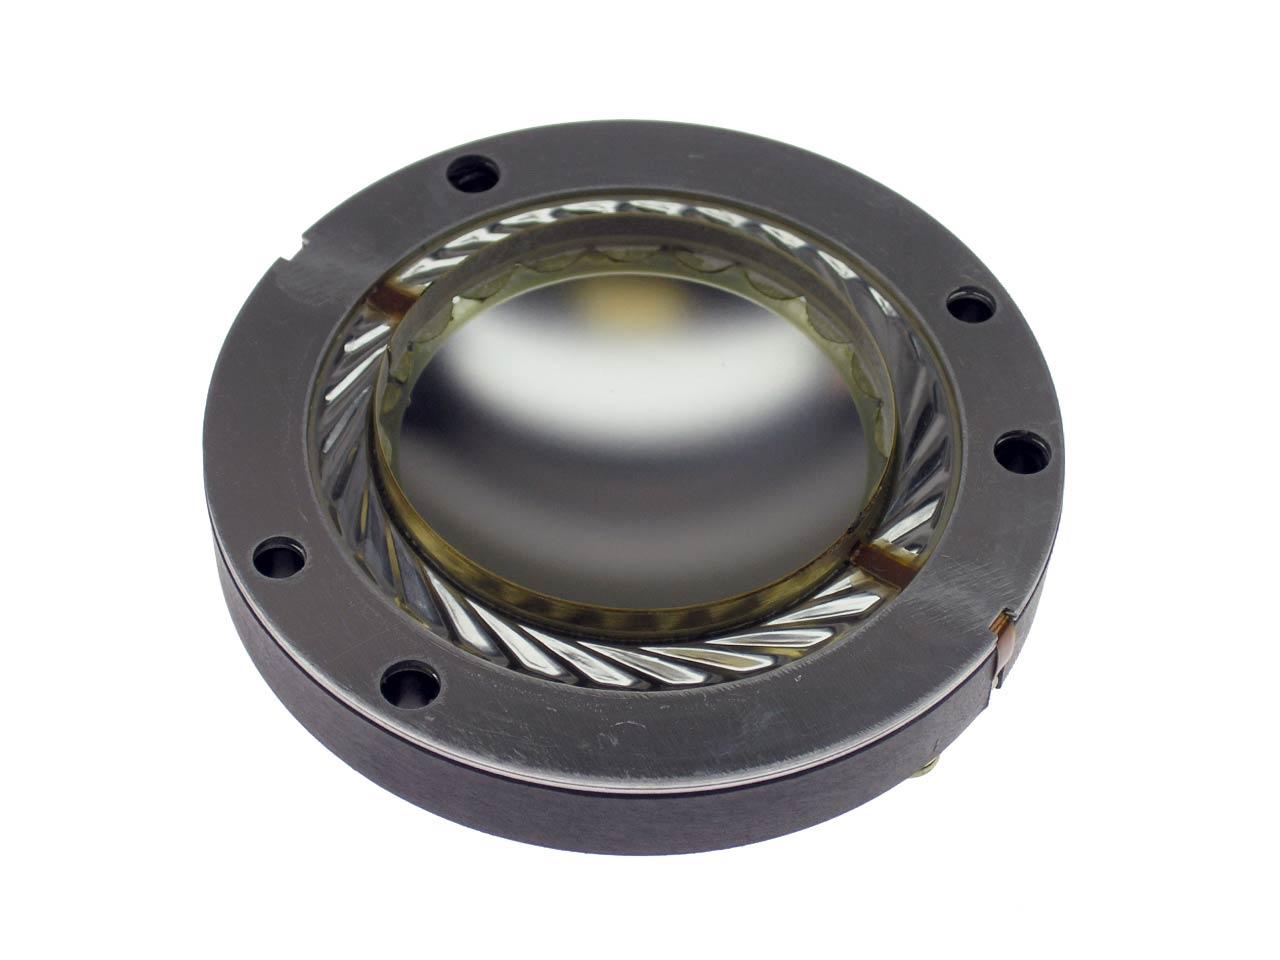 SS Audio Diaphragm for Altec Lansing 600, 800, 900, 8 Ohm, D-808-8